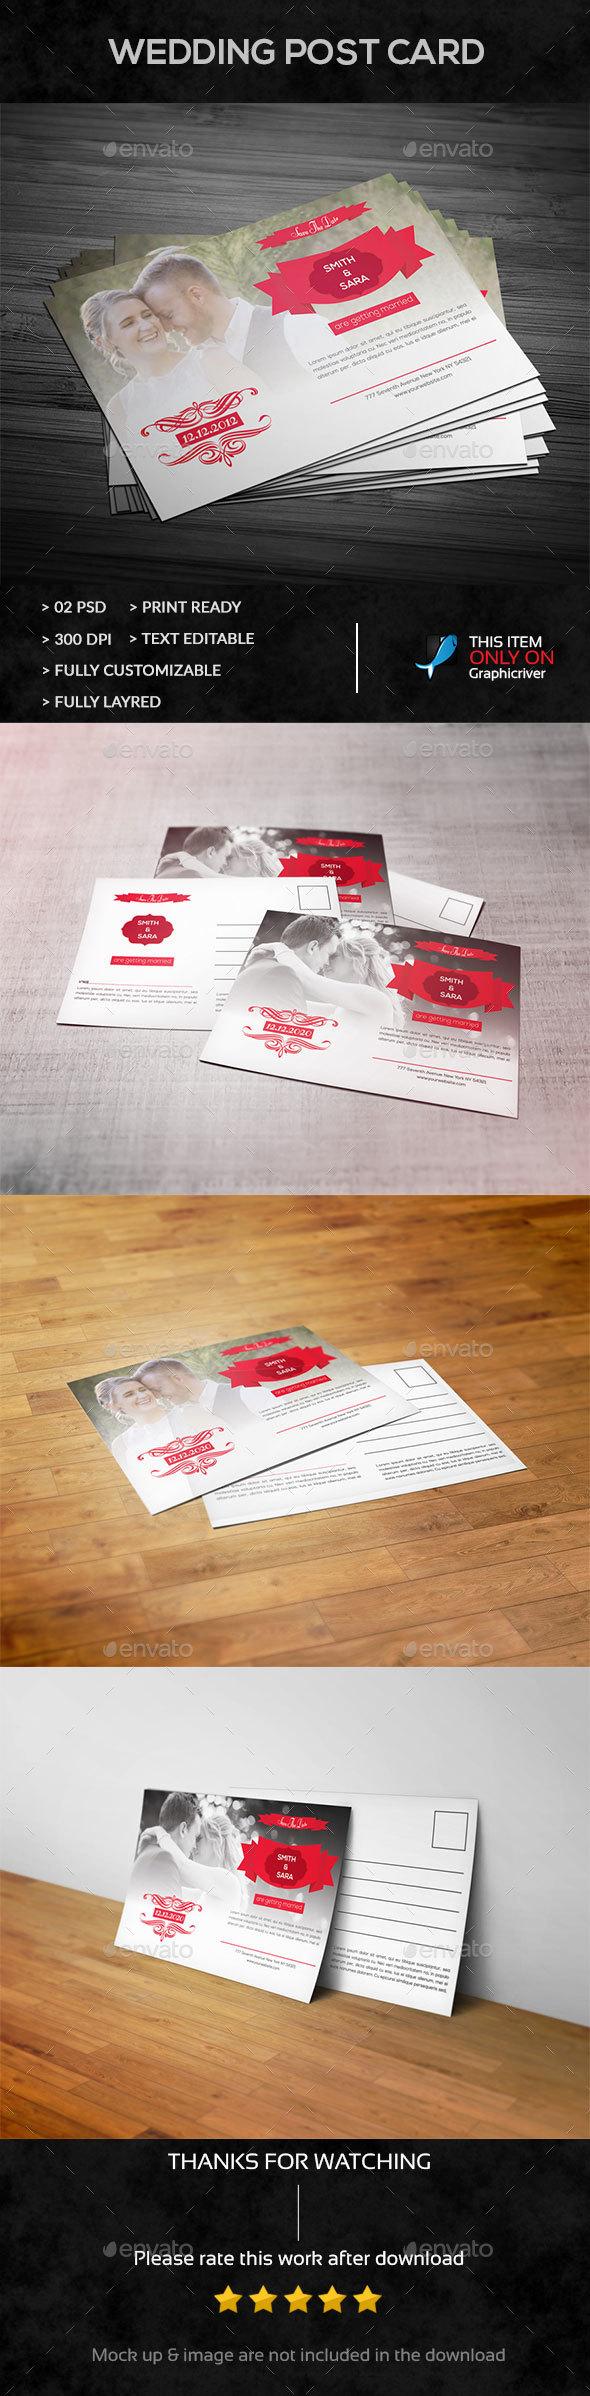 Wedding Post Card